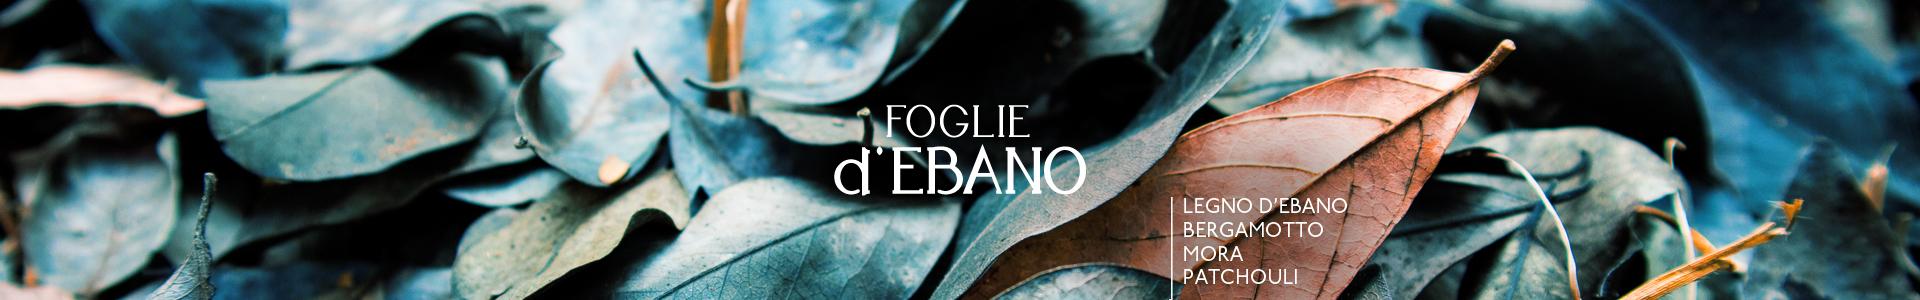 Foglie-dEbano-1920x300-110918